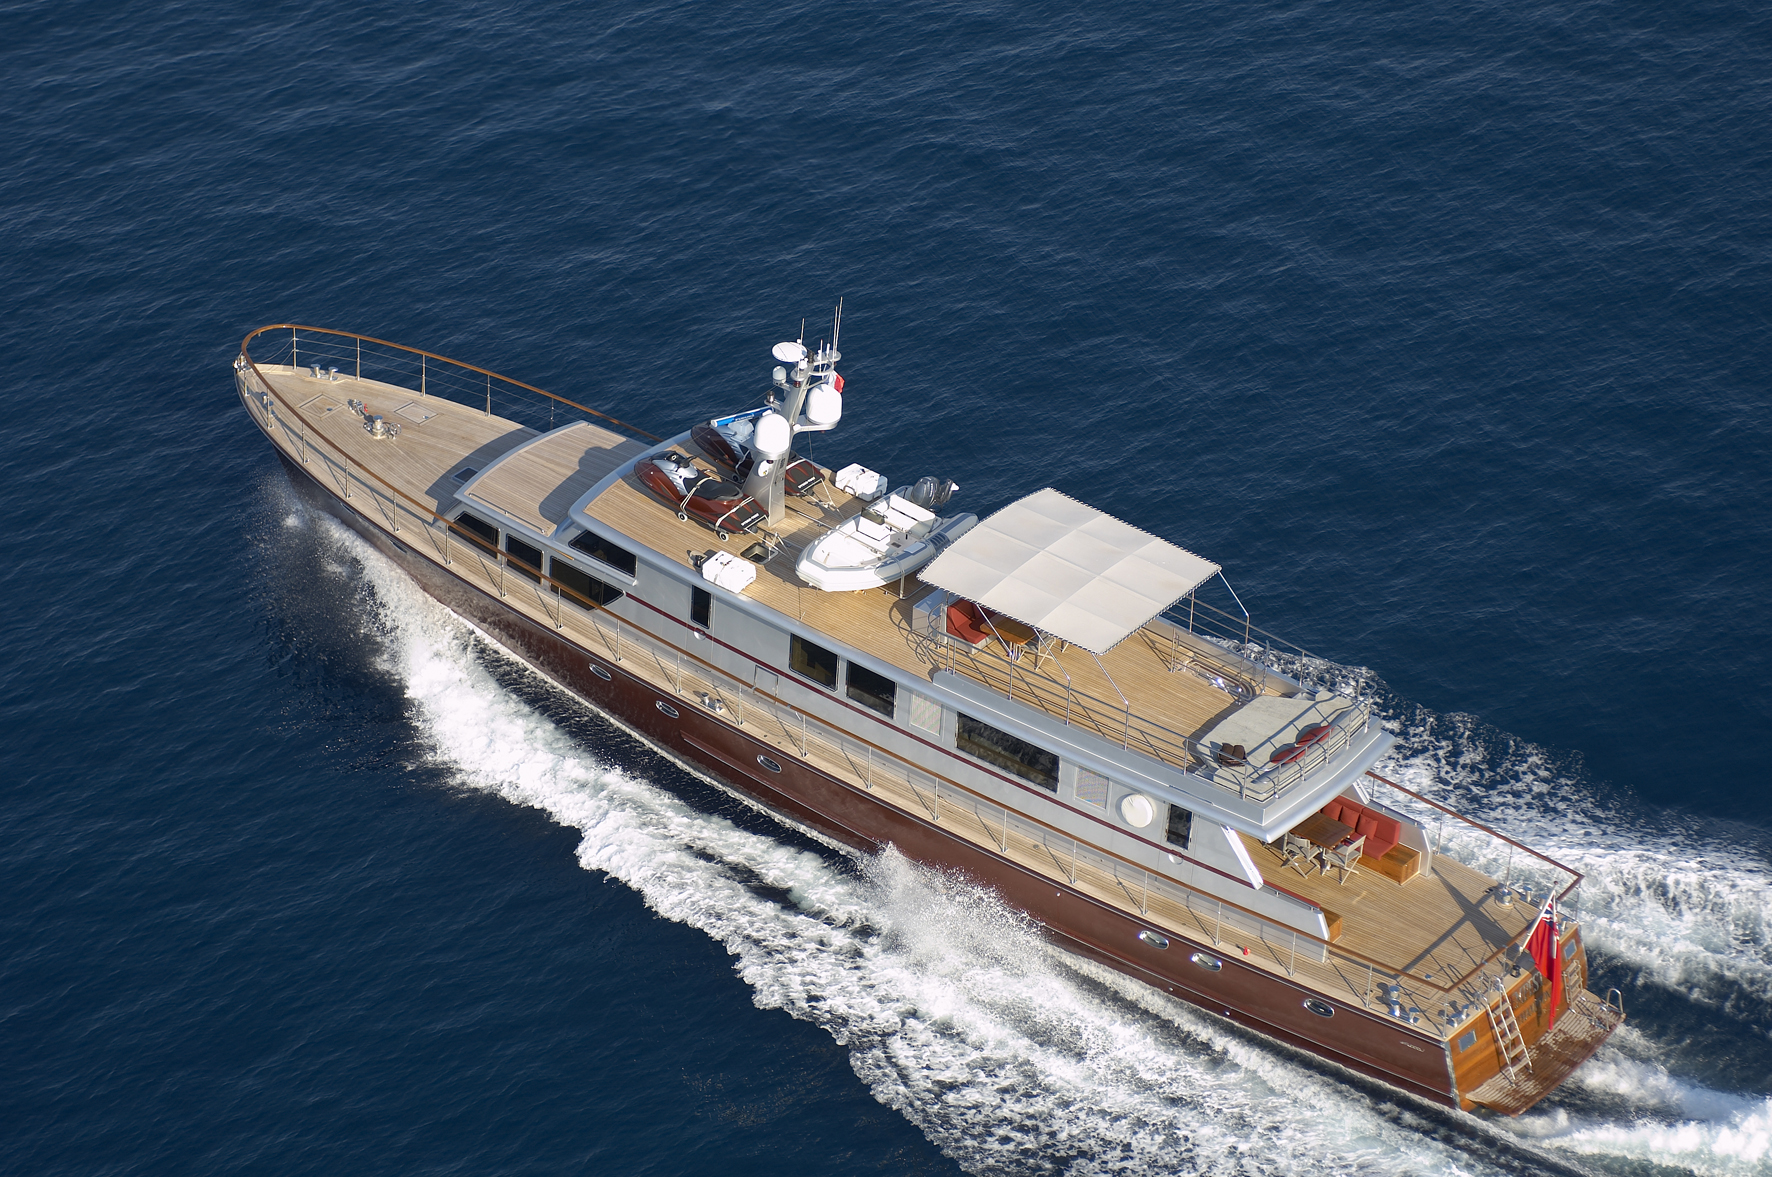 Classic Yacht TEMPEST WS - Cruising